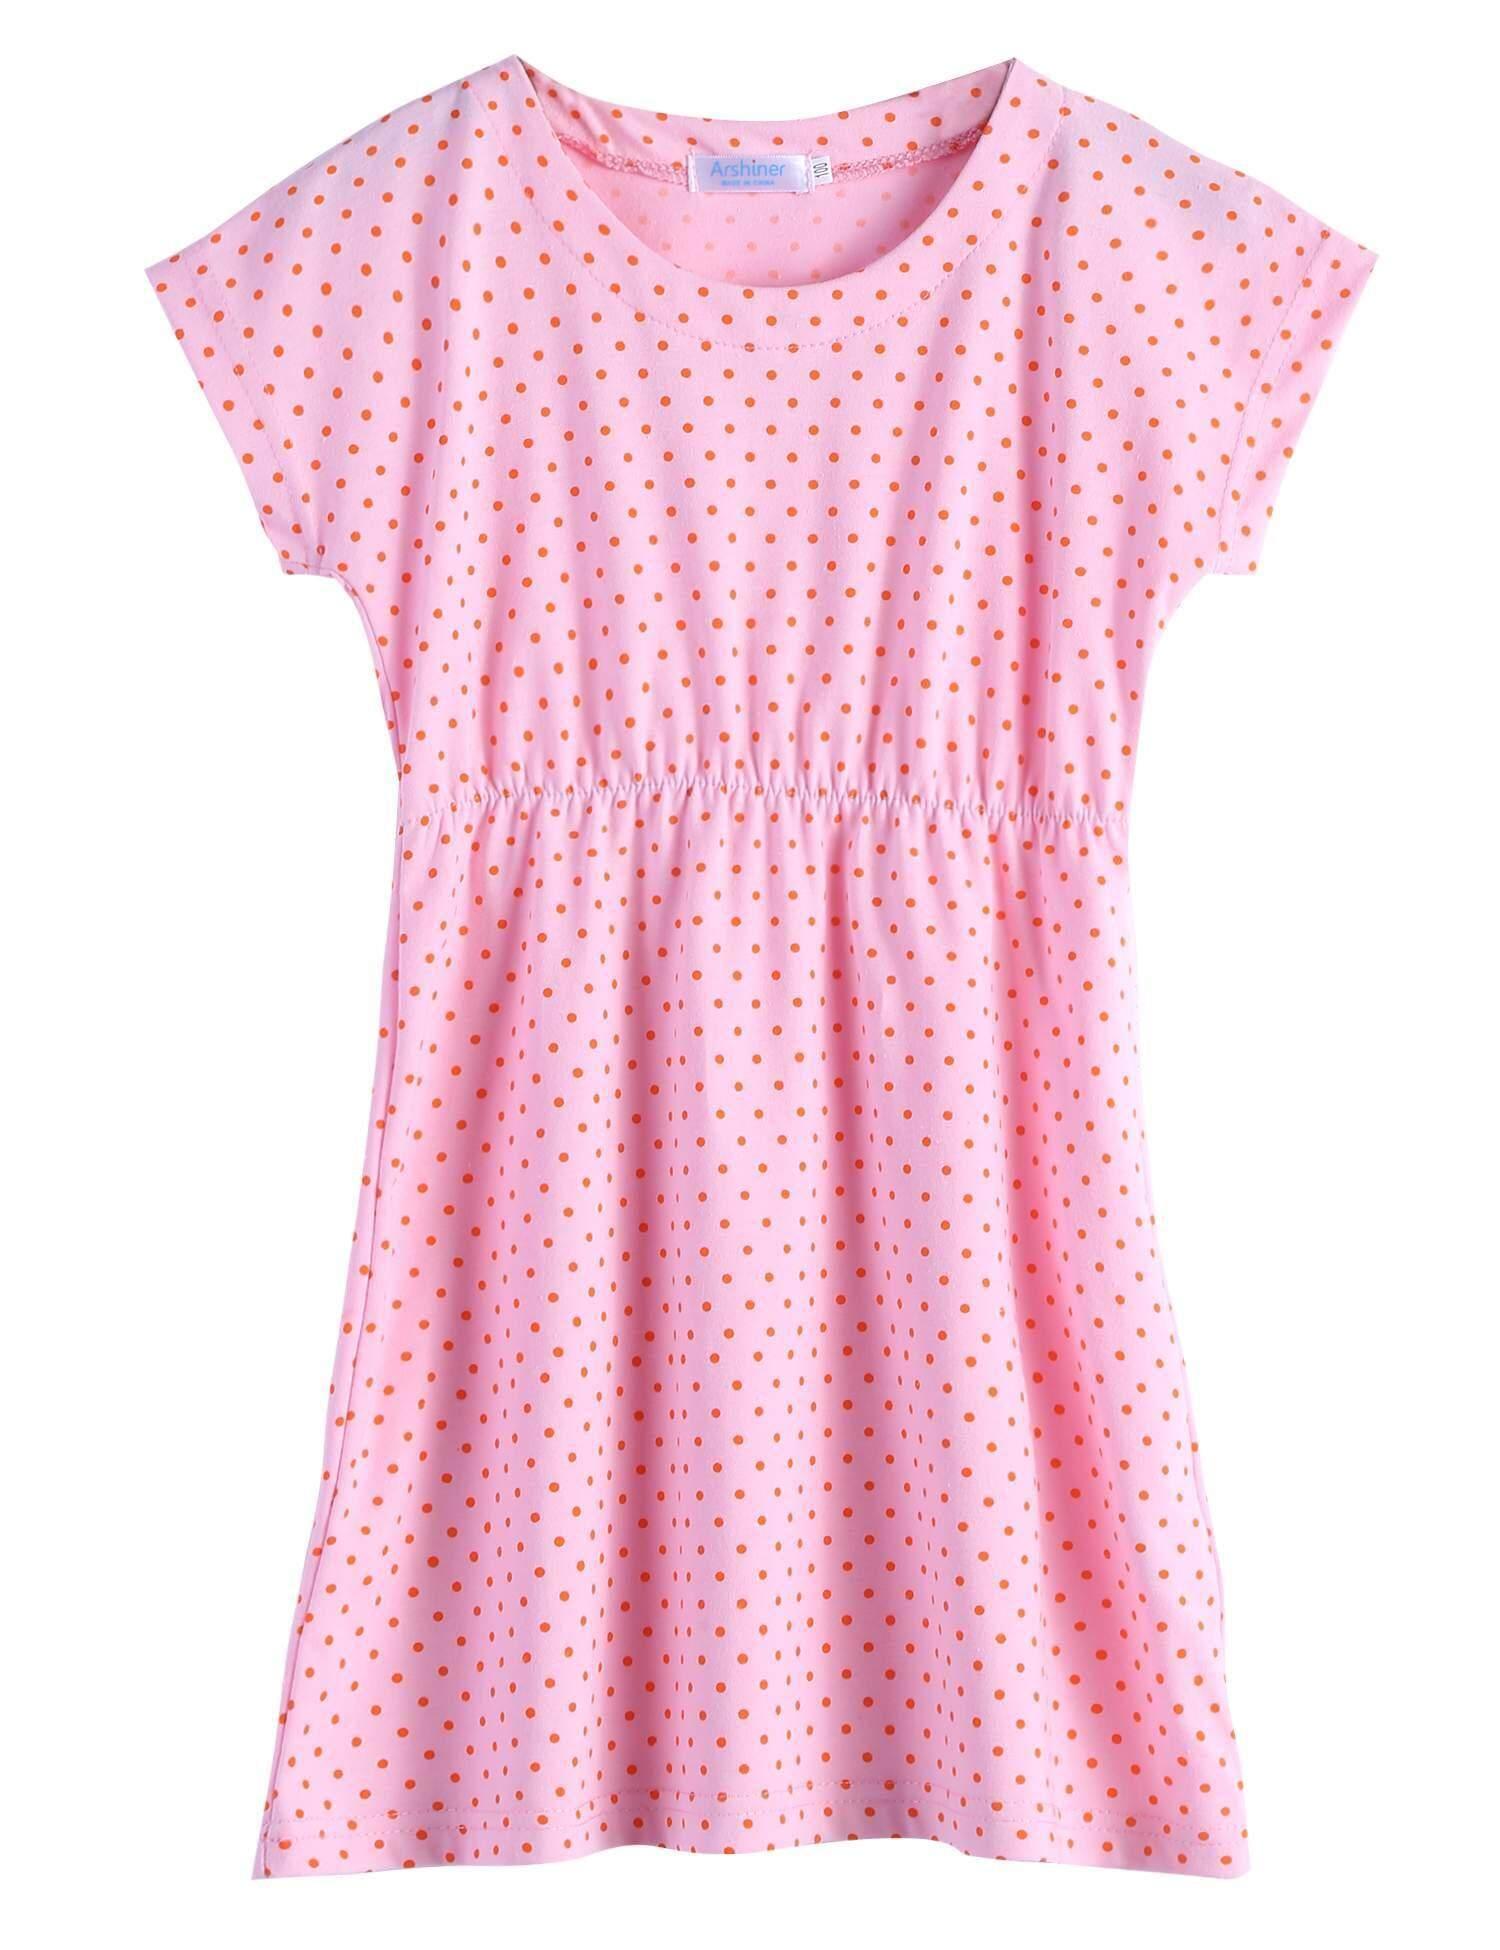 Clearance Penjualan Baru Anak Gadis Lengan Pendek Titik Lucu Gaun Mewah Gaun-Internasional